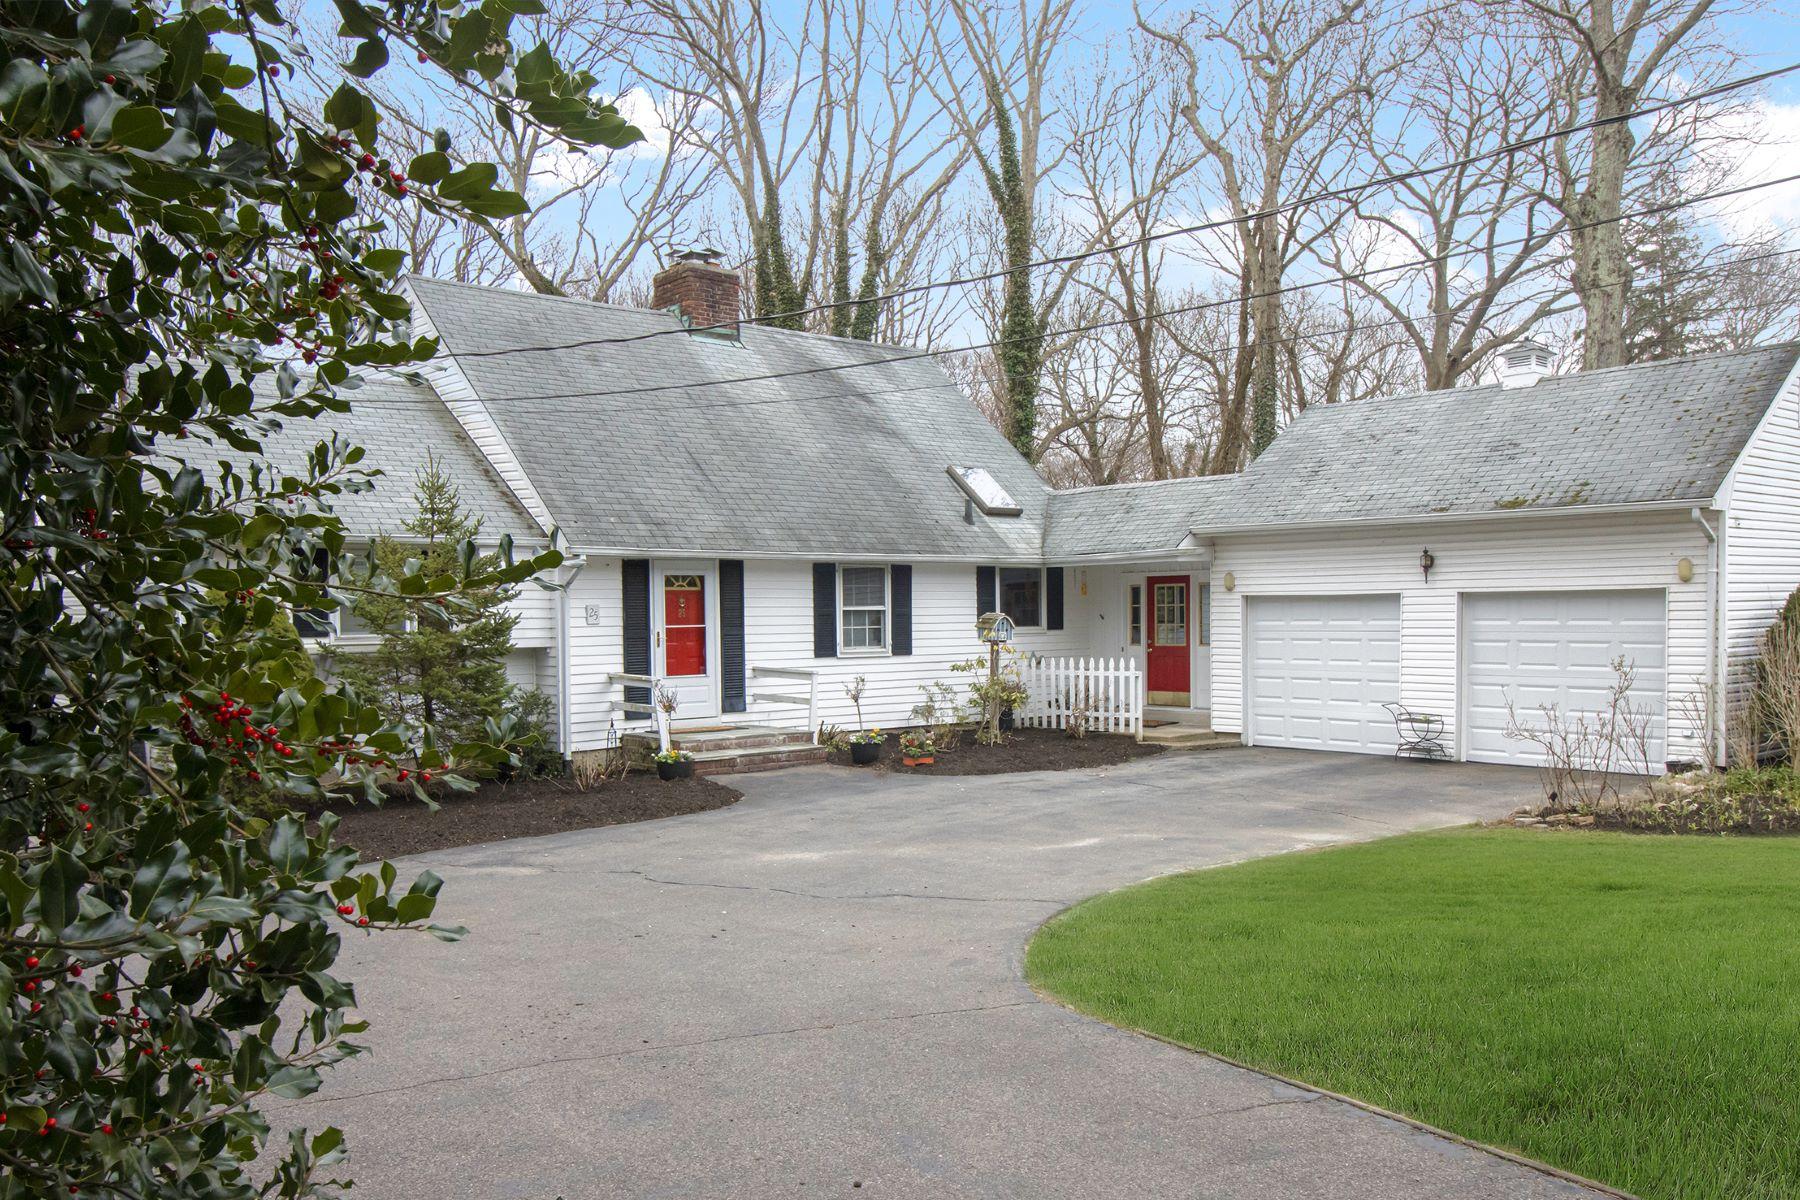 Single Family Homes for Active at Setauket 25 Thompson Hay Path Setauket, New York 11733 United States